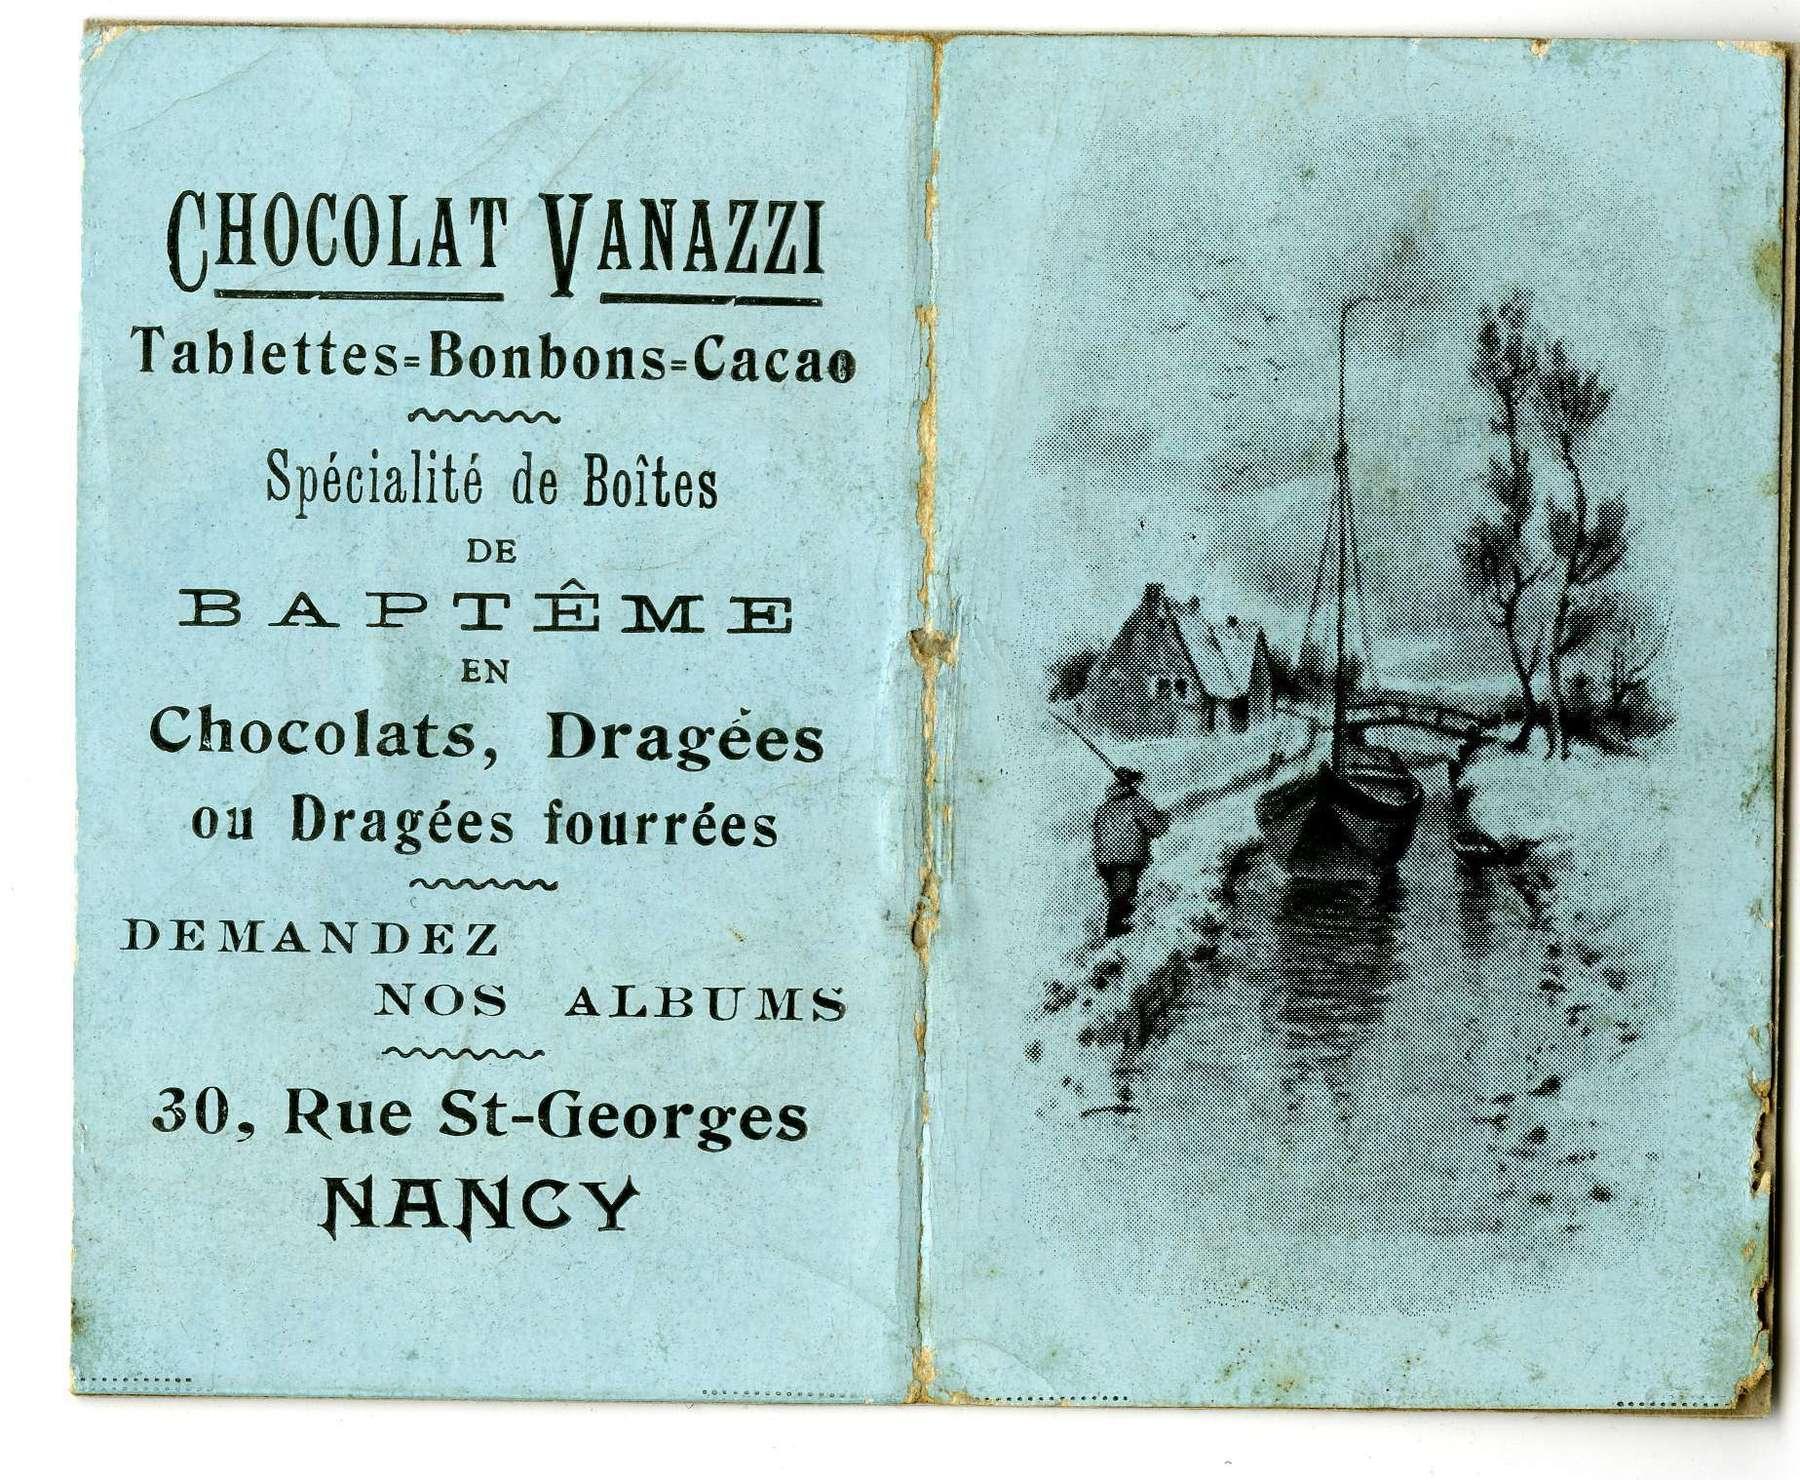 Contenu du Chocolat Vanazzi